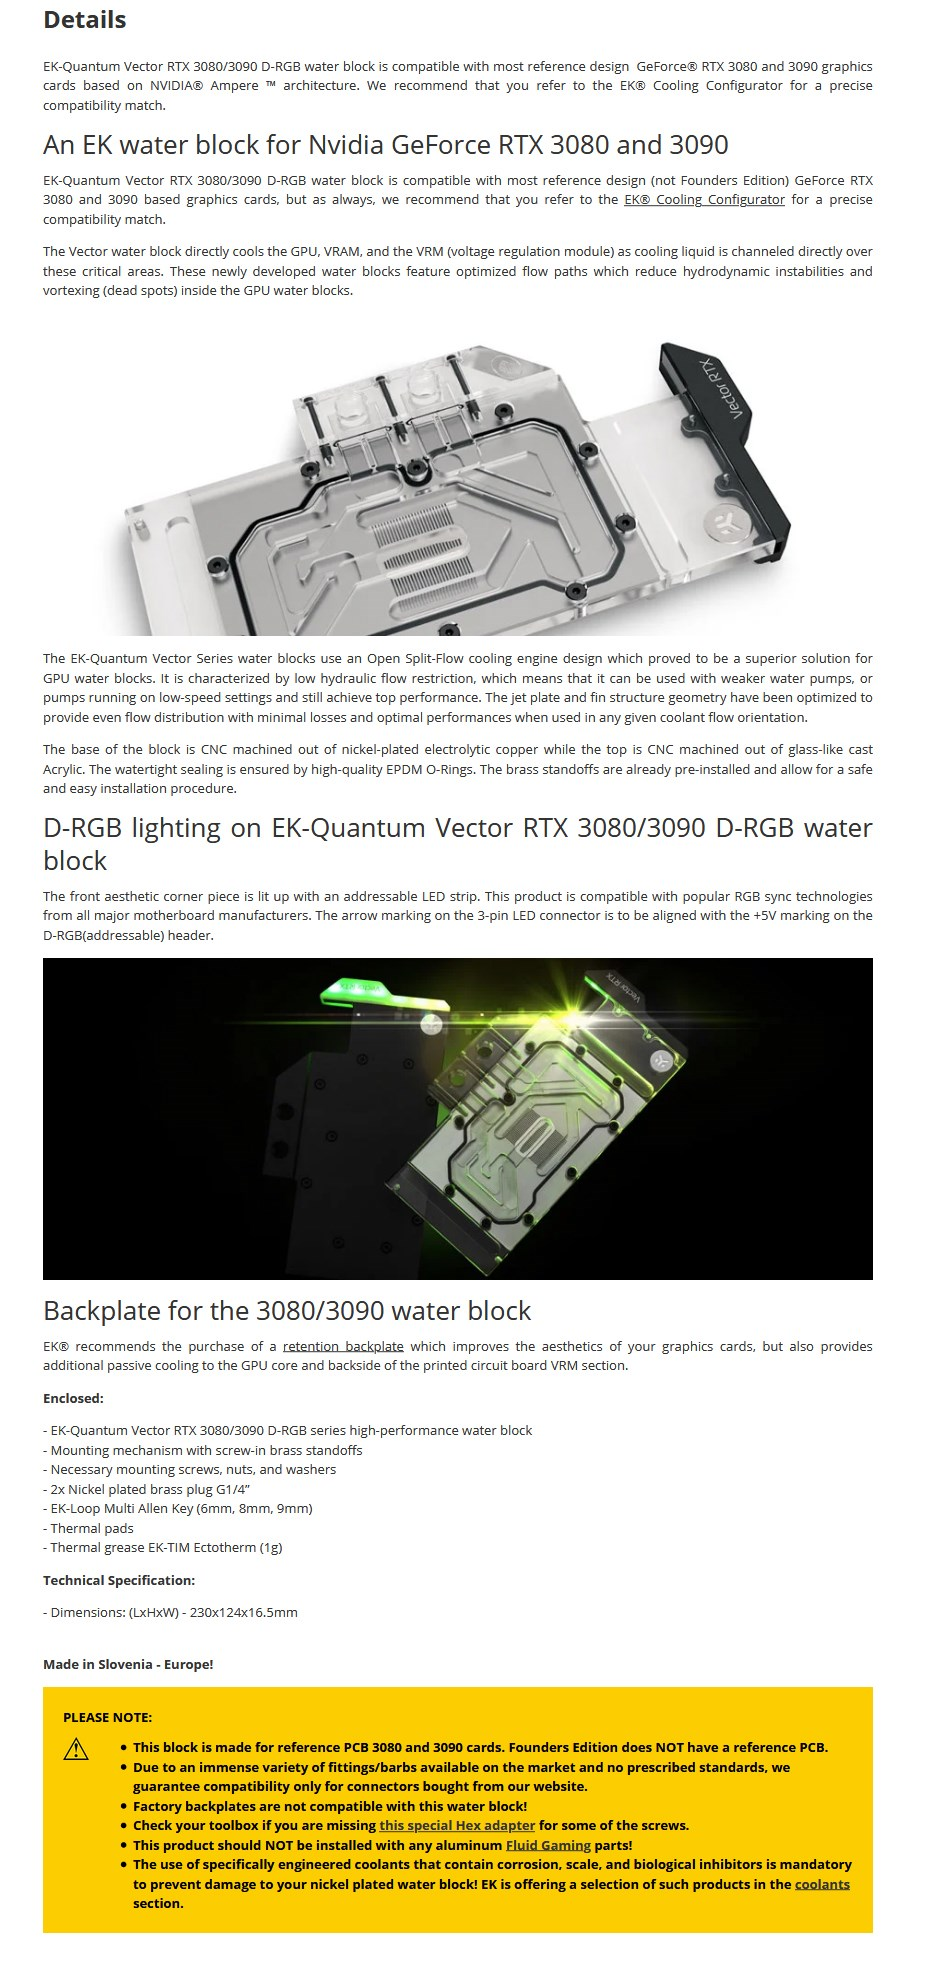 EKWB EK-Quantum Vector RTX 3080/3090 D-RGB - Nickel + Plexi - Overview 1